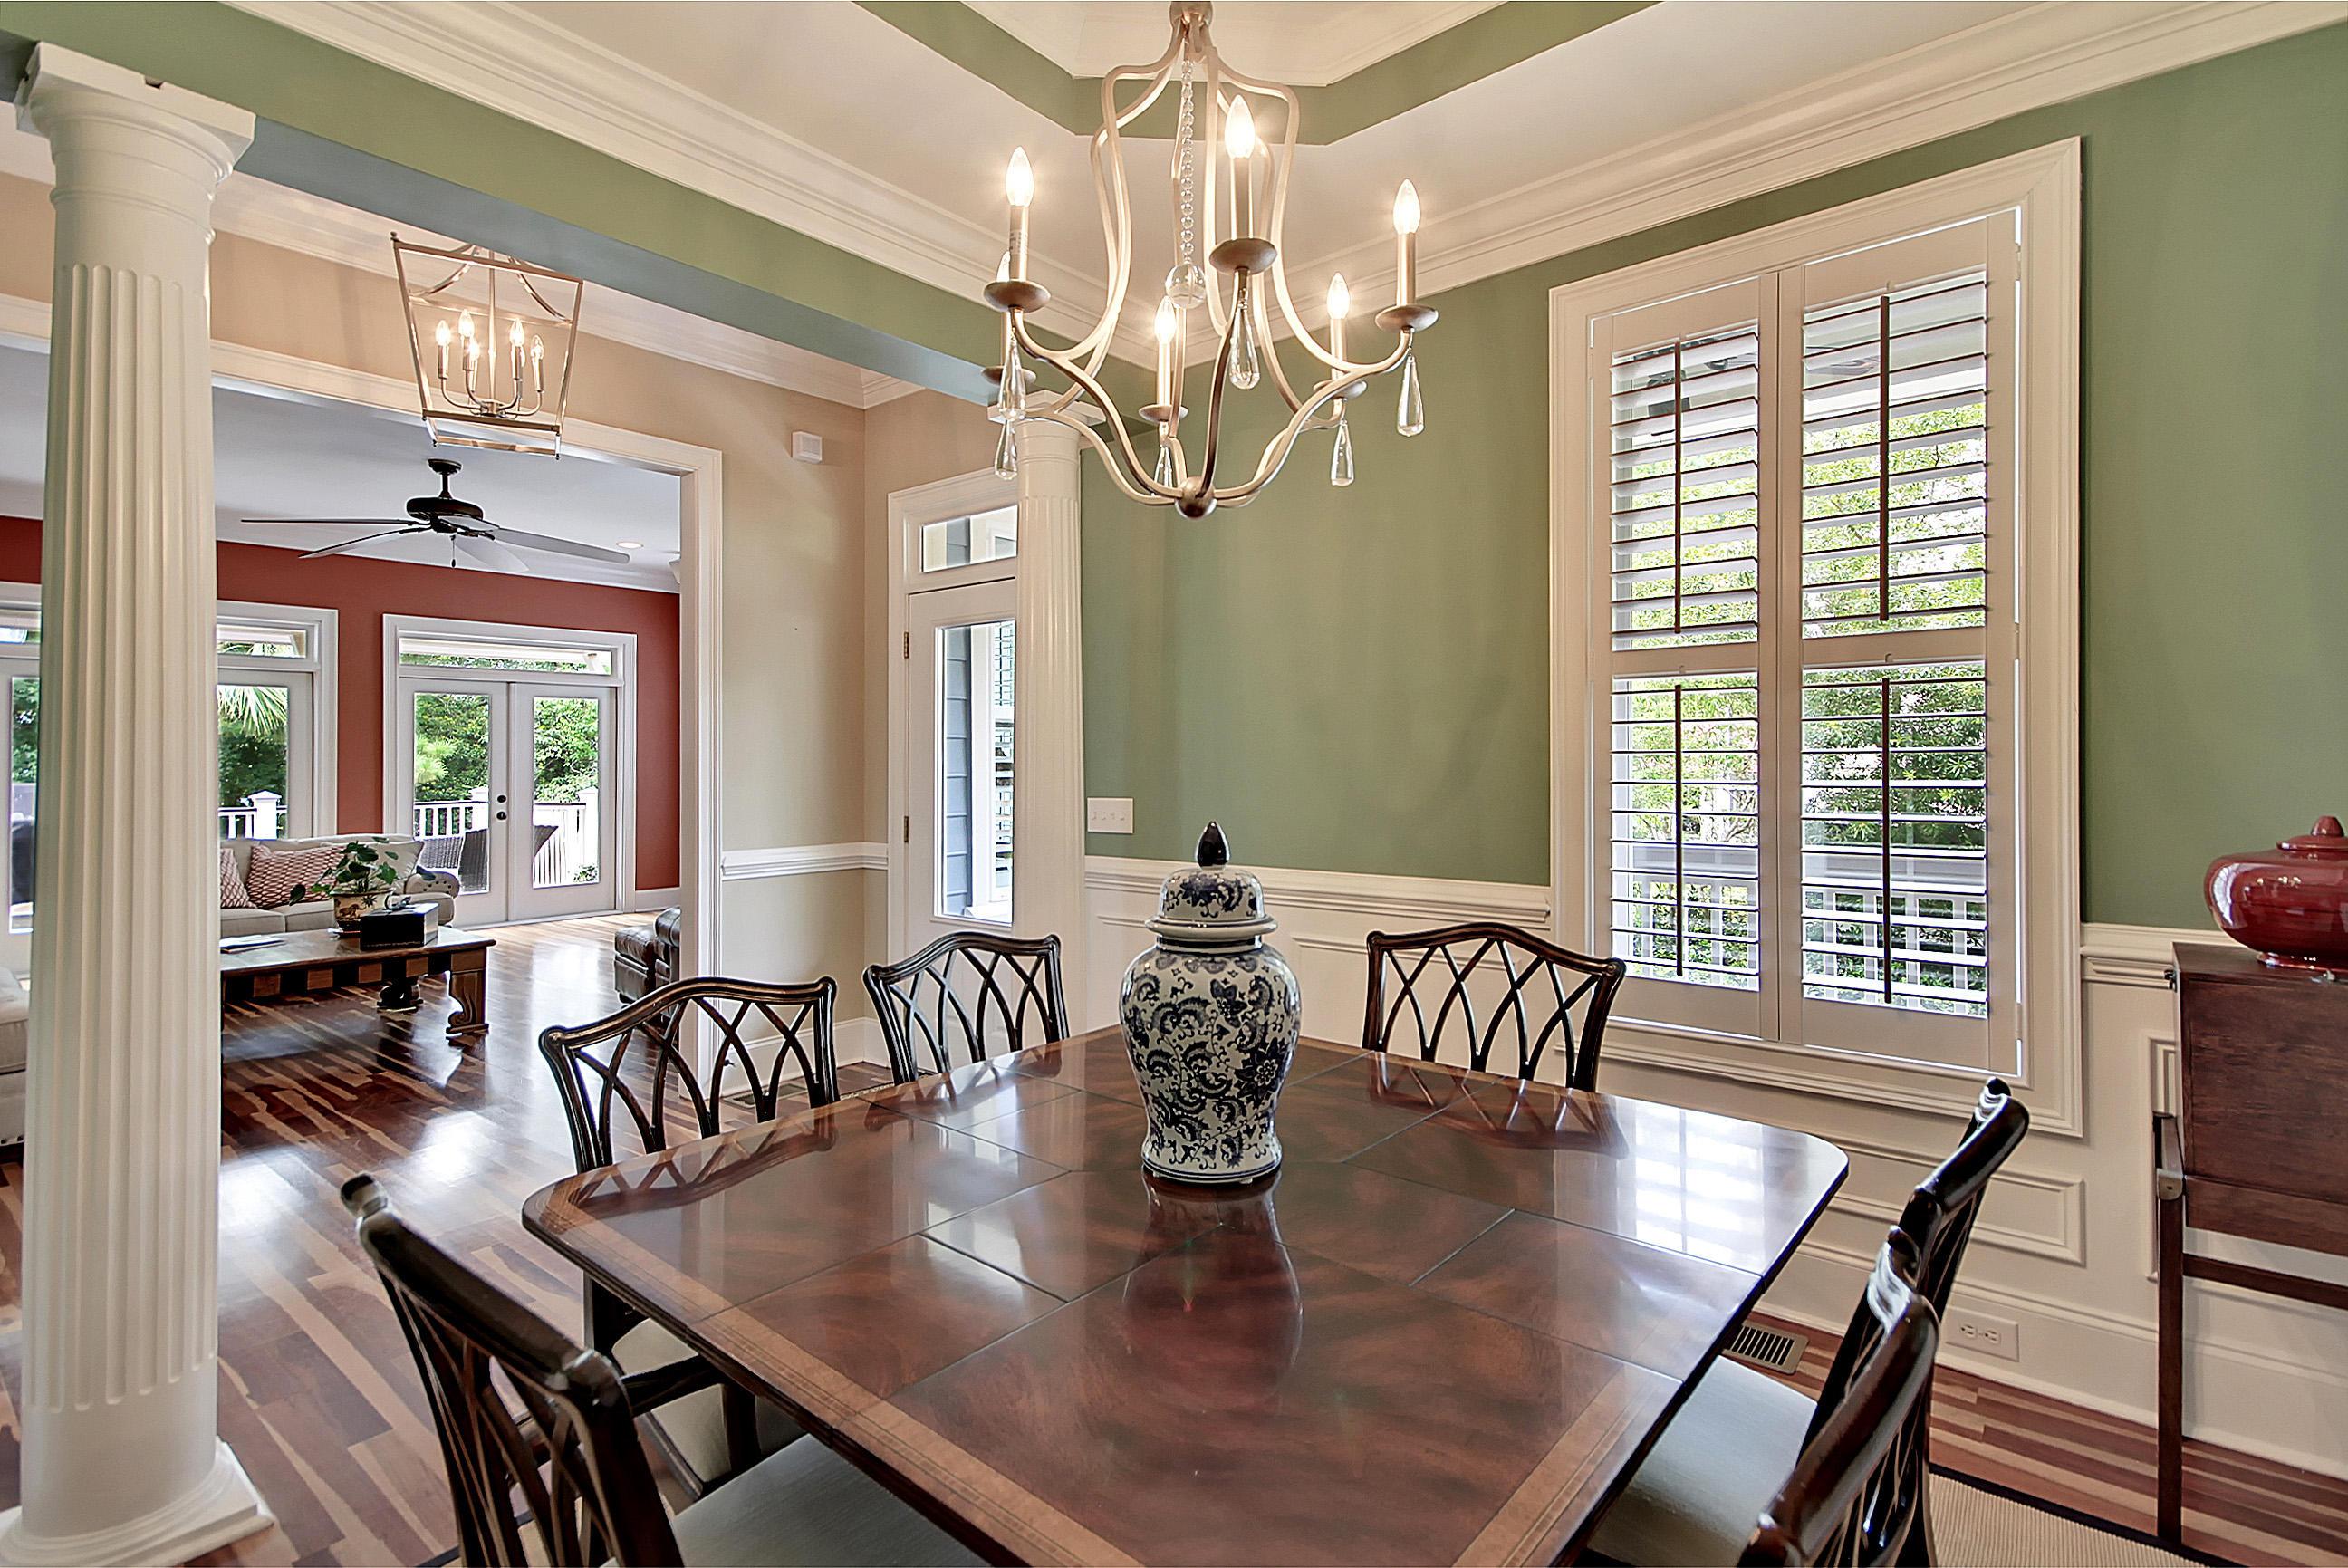 Belle Hall Homes For Sale - 368 Evian, Mount Pleasant, SC - 39